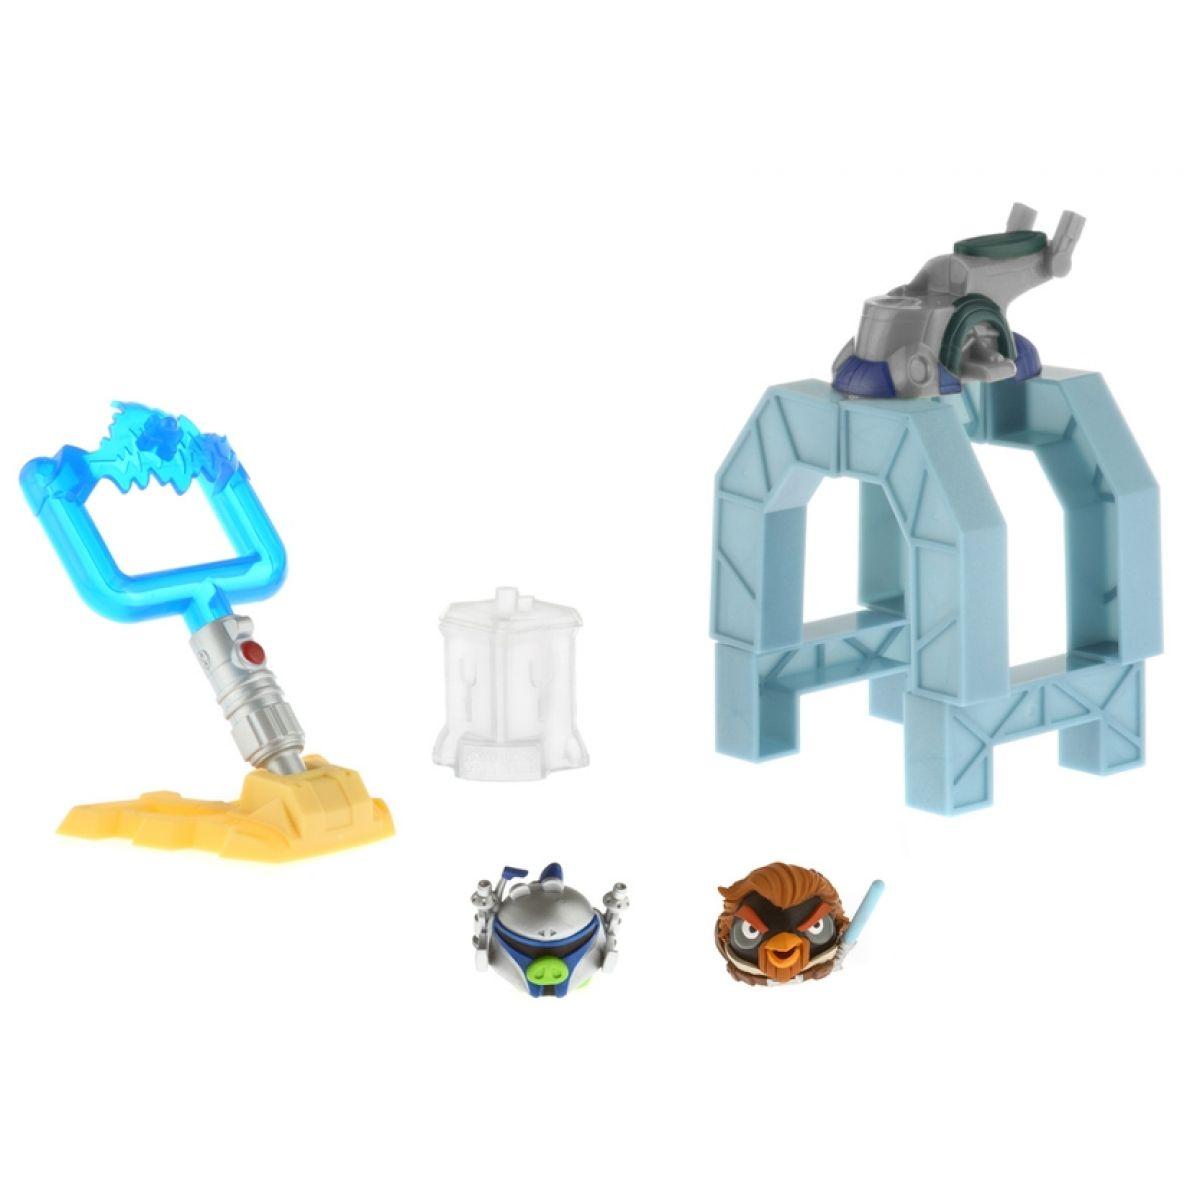 Angry Birds hrací sada Telepods s figurkami - Bounty Hunters